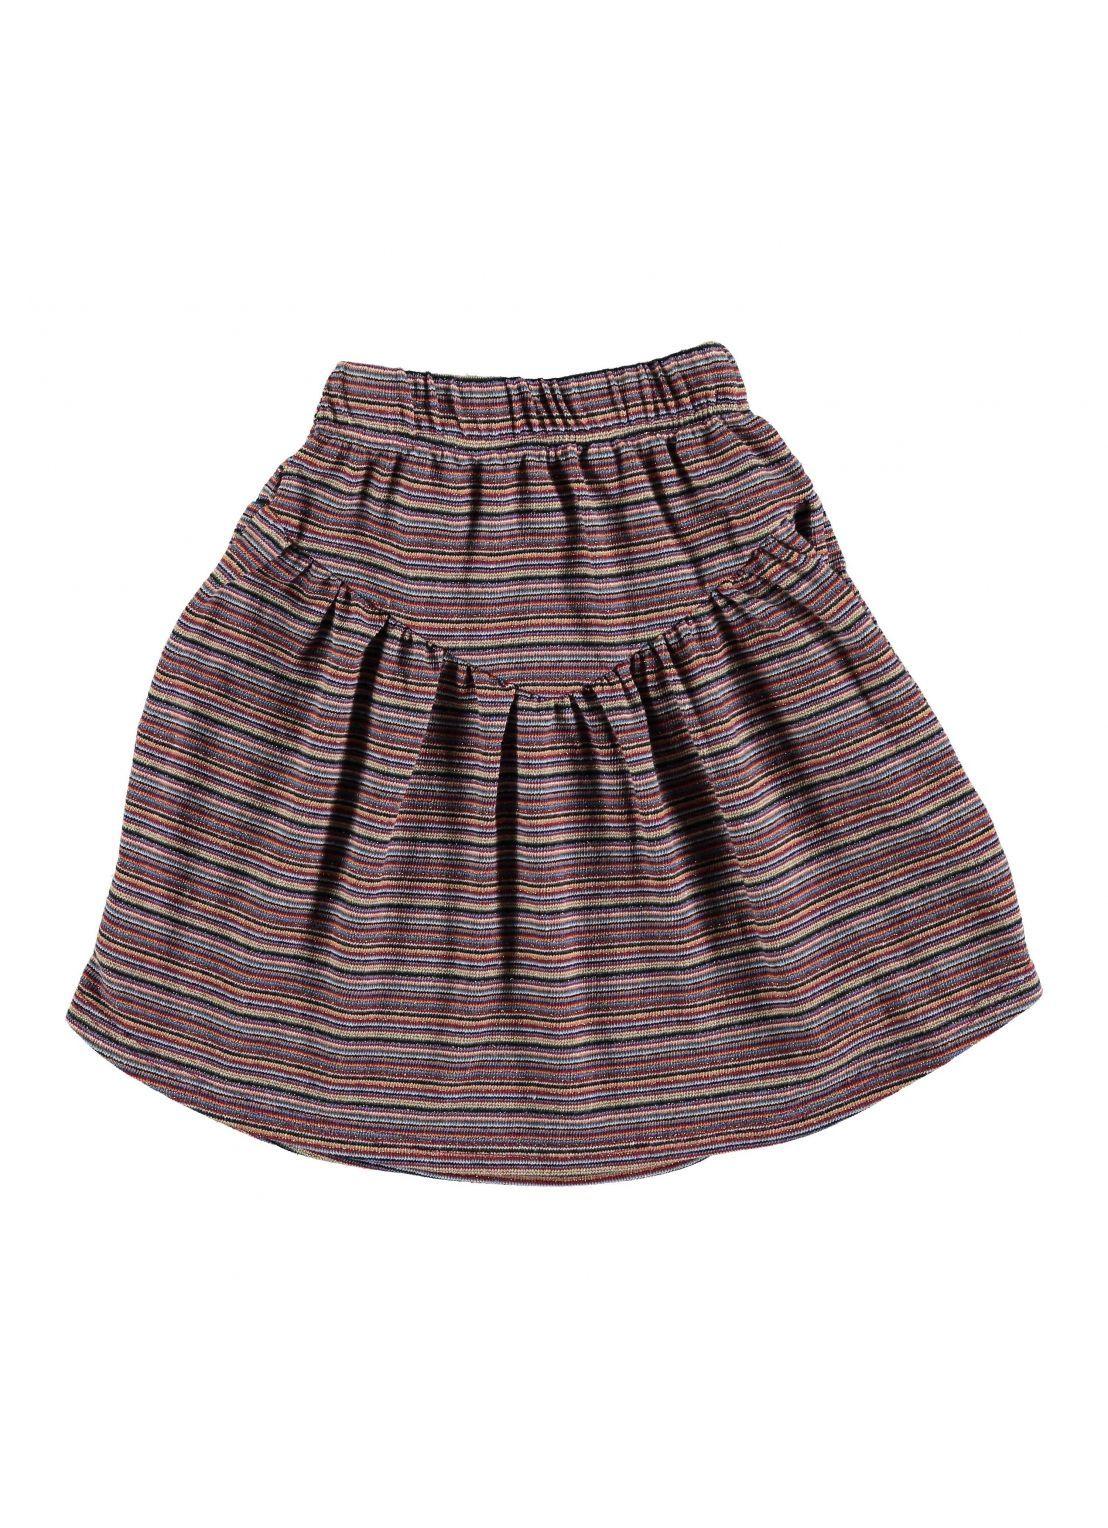 Kit SKIRT Girl-50 % CO, 36 PAC, 6 % ME, 4 % OF, 4% EA- Knitted